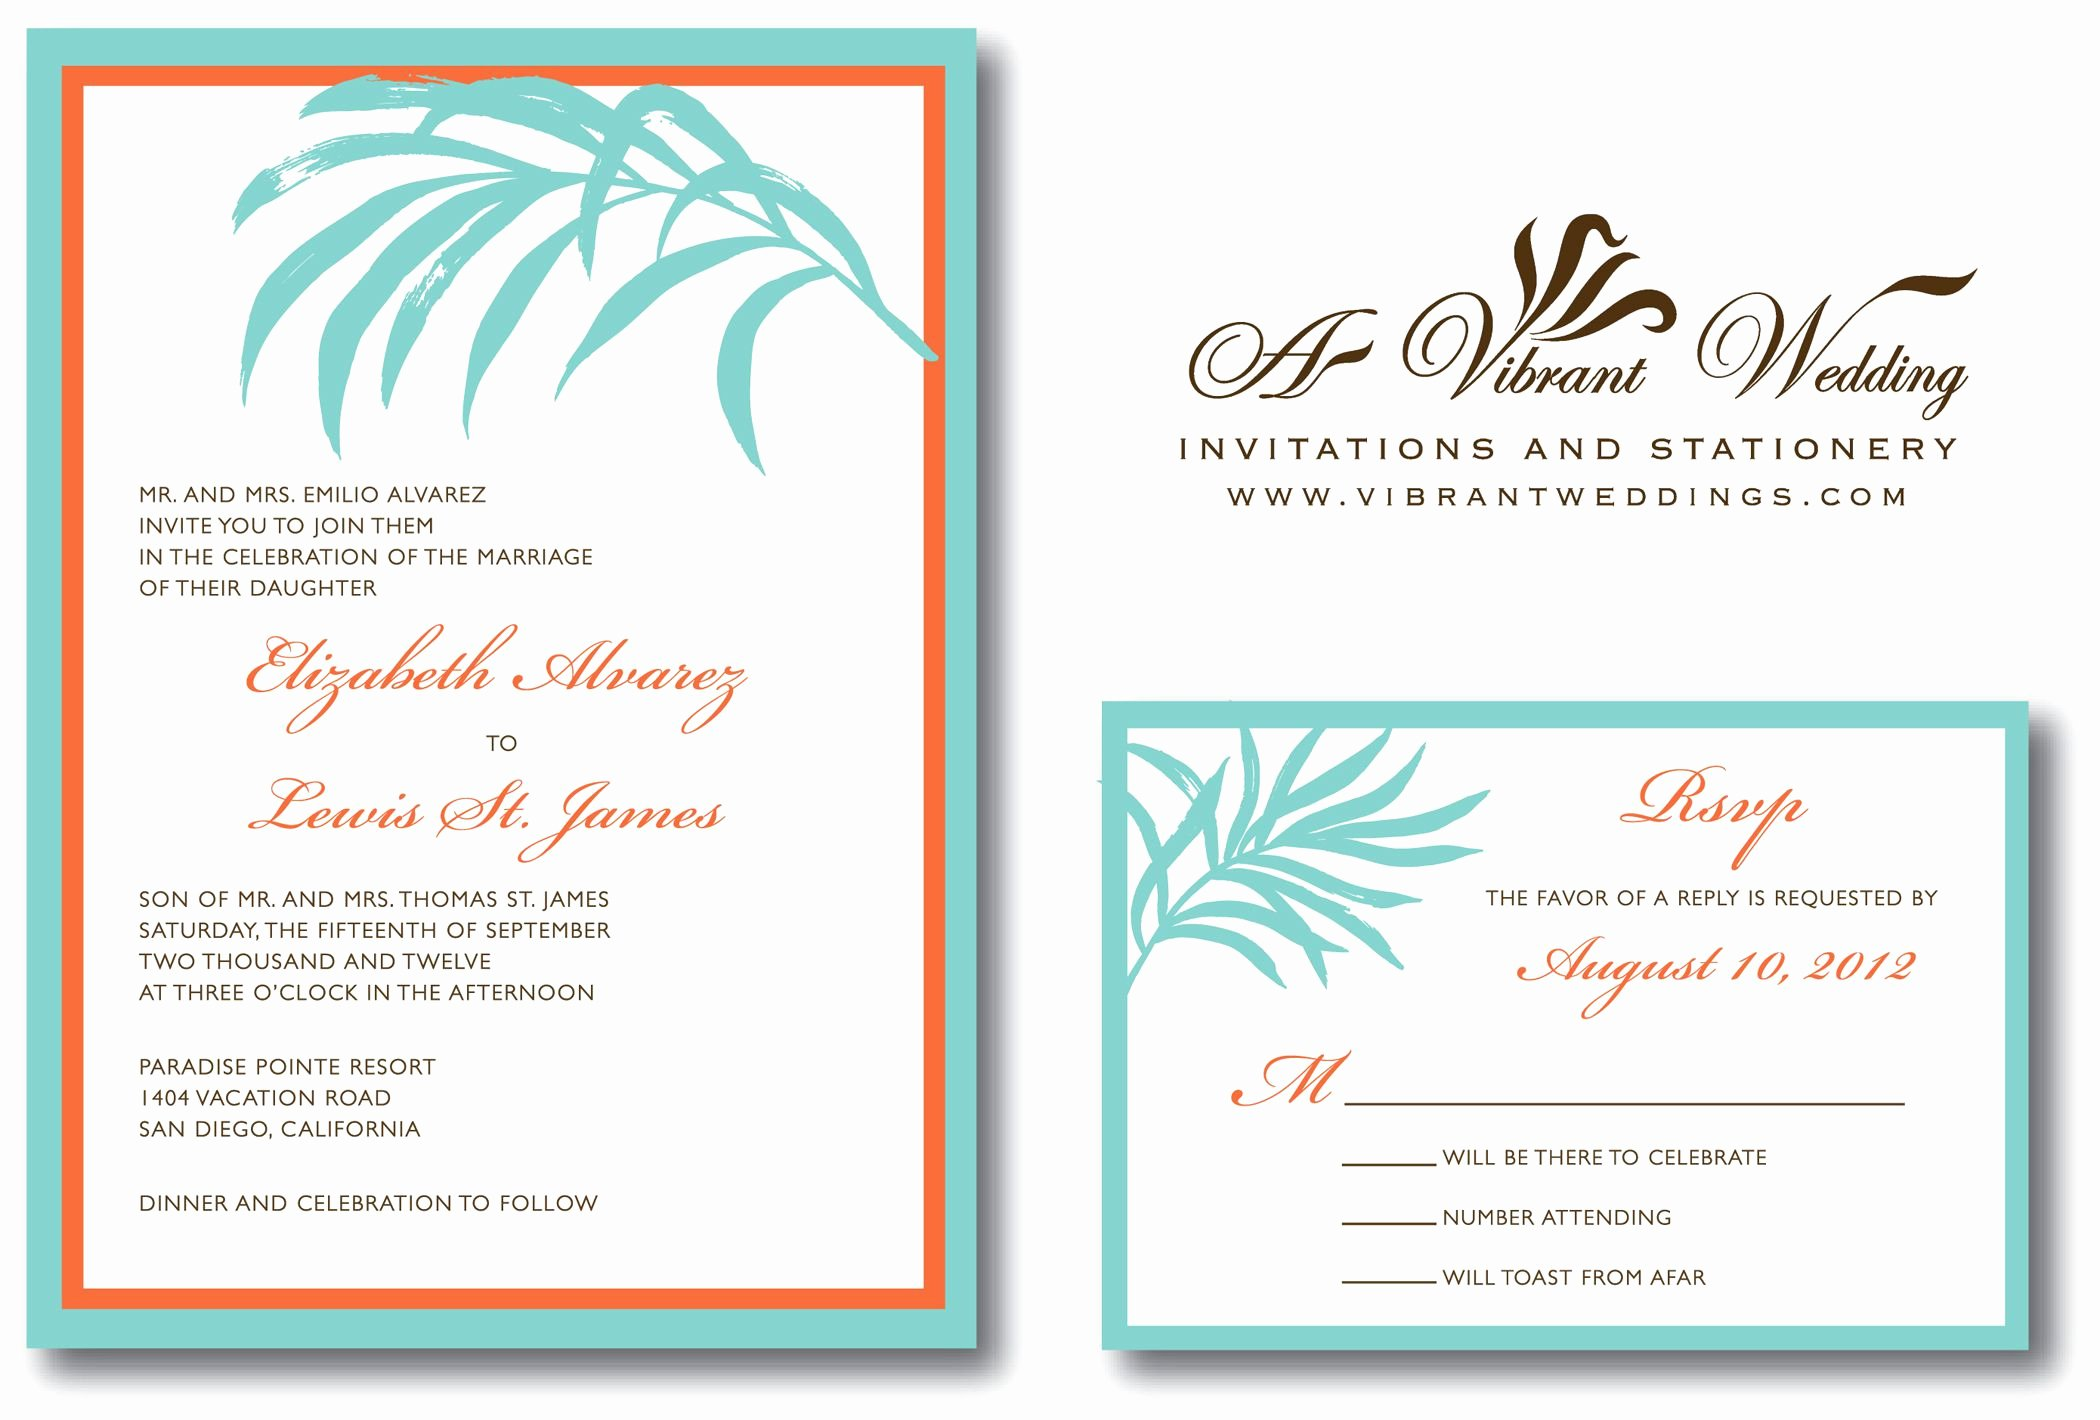 Beach Wedding Invitation Templates Luxury Beach Wedding Invitations Wording Beach Wedding Invitation Wording attire Invitations